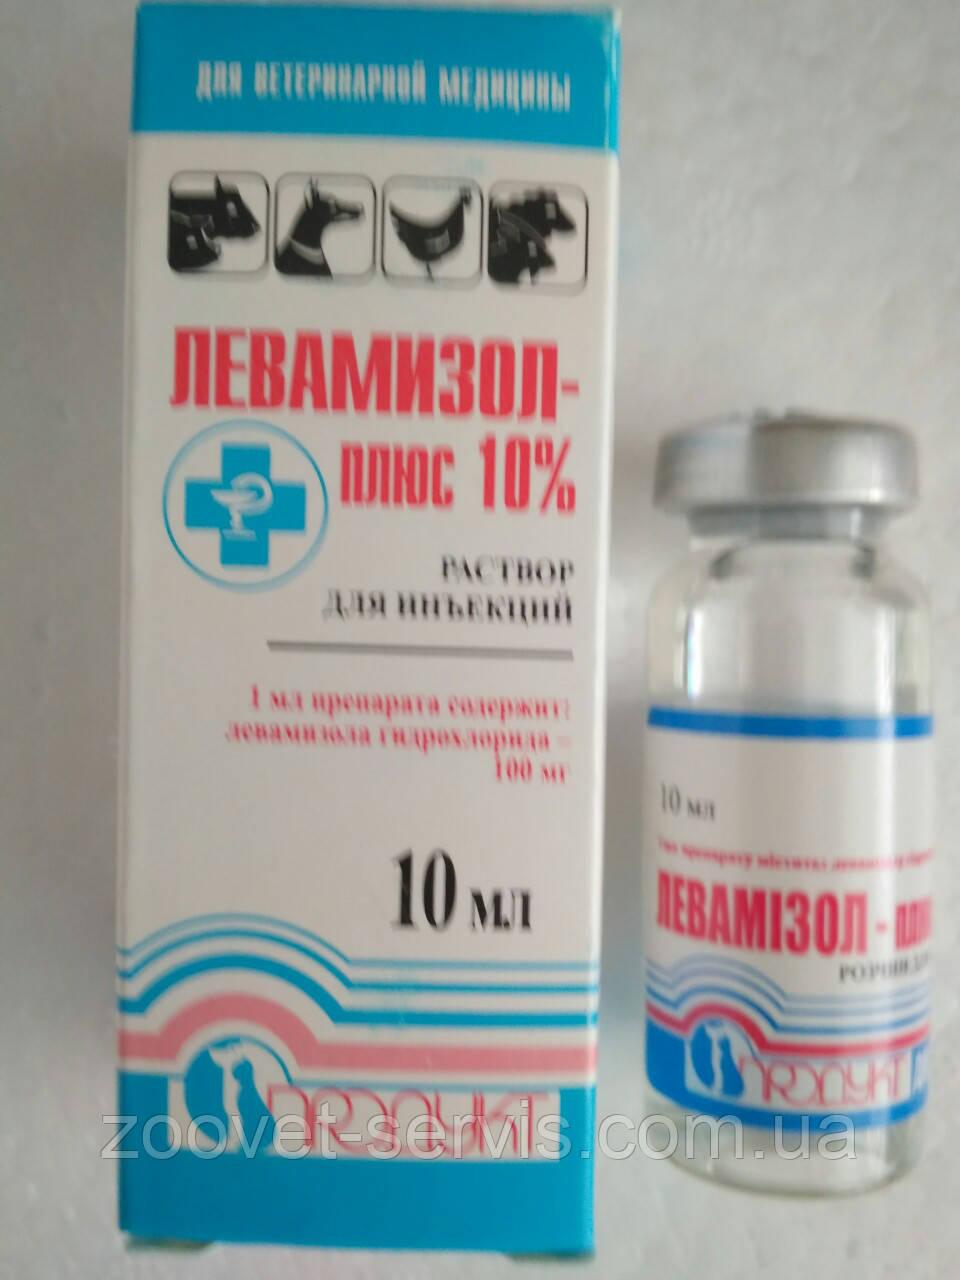 Левамизол-ПЛЮС 10% 10 мл